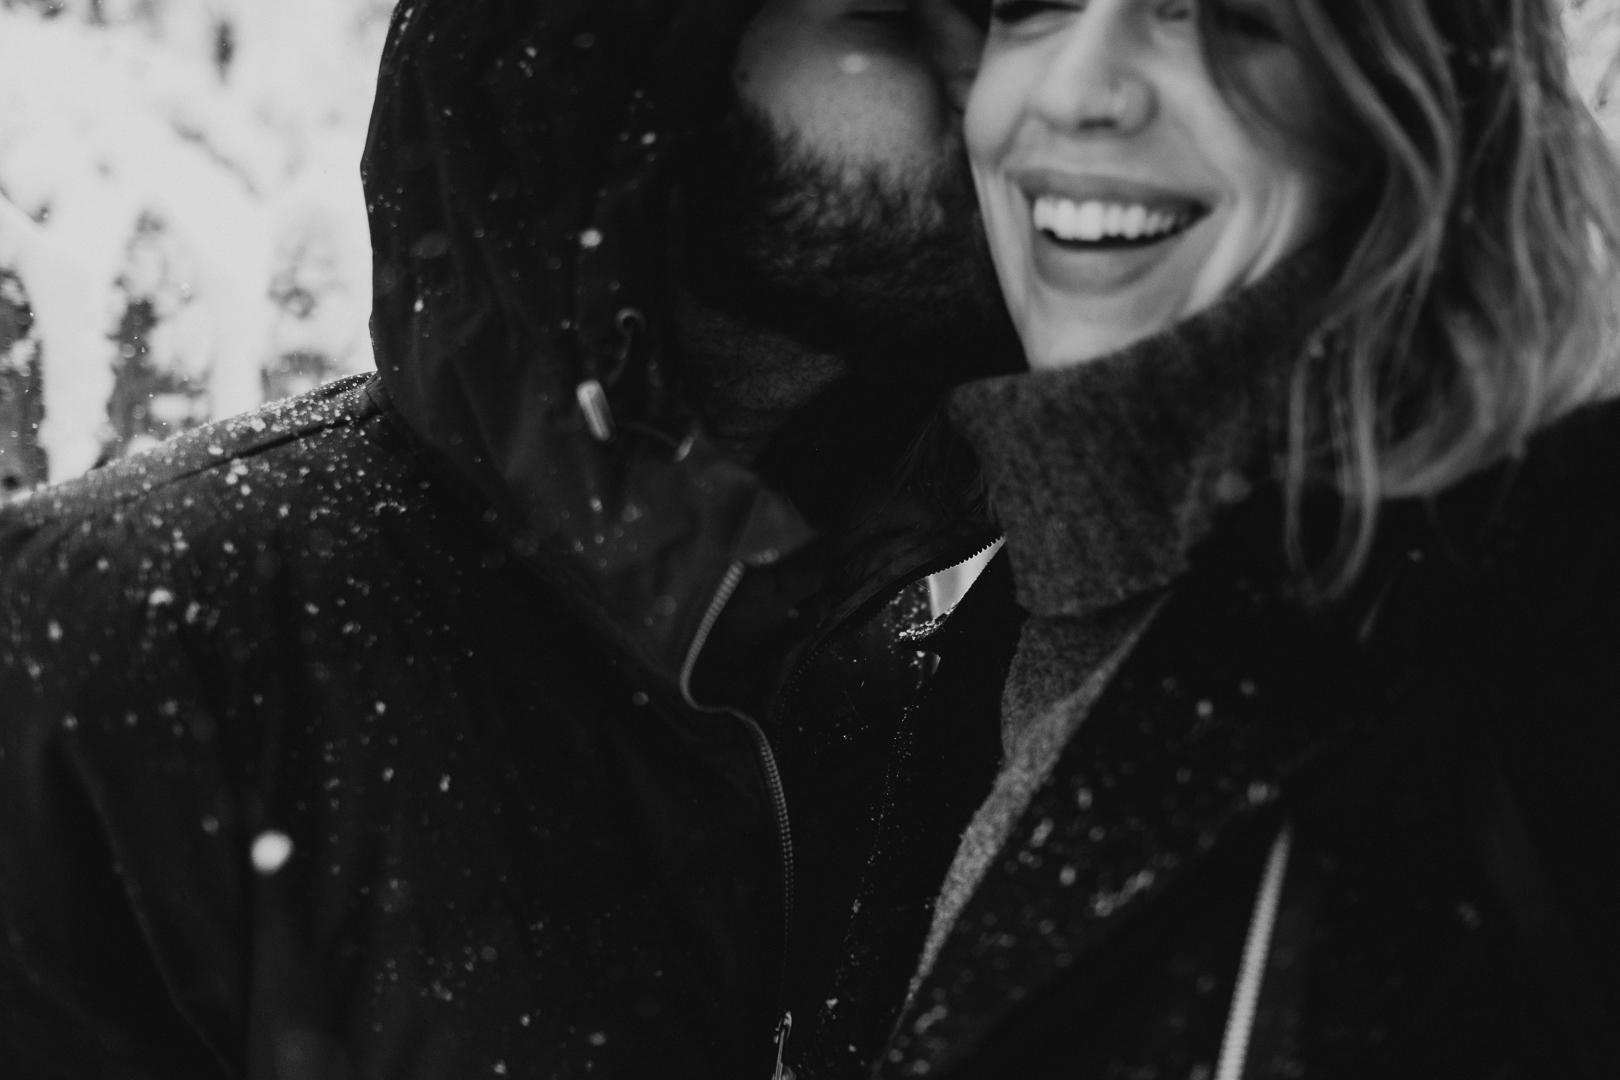 20190112_snowydaysin_kansascity_alihapperphoto_20.jpg